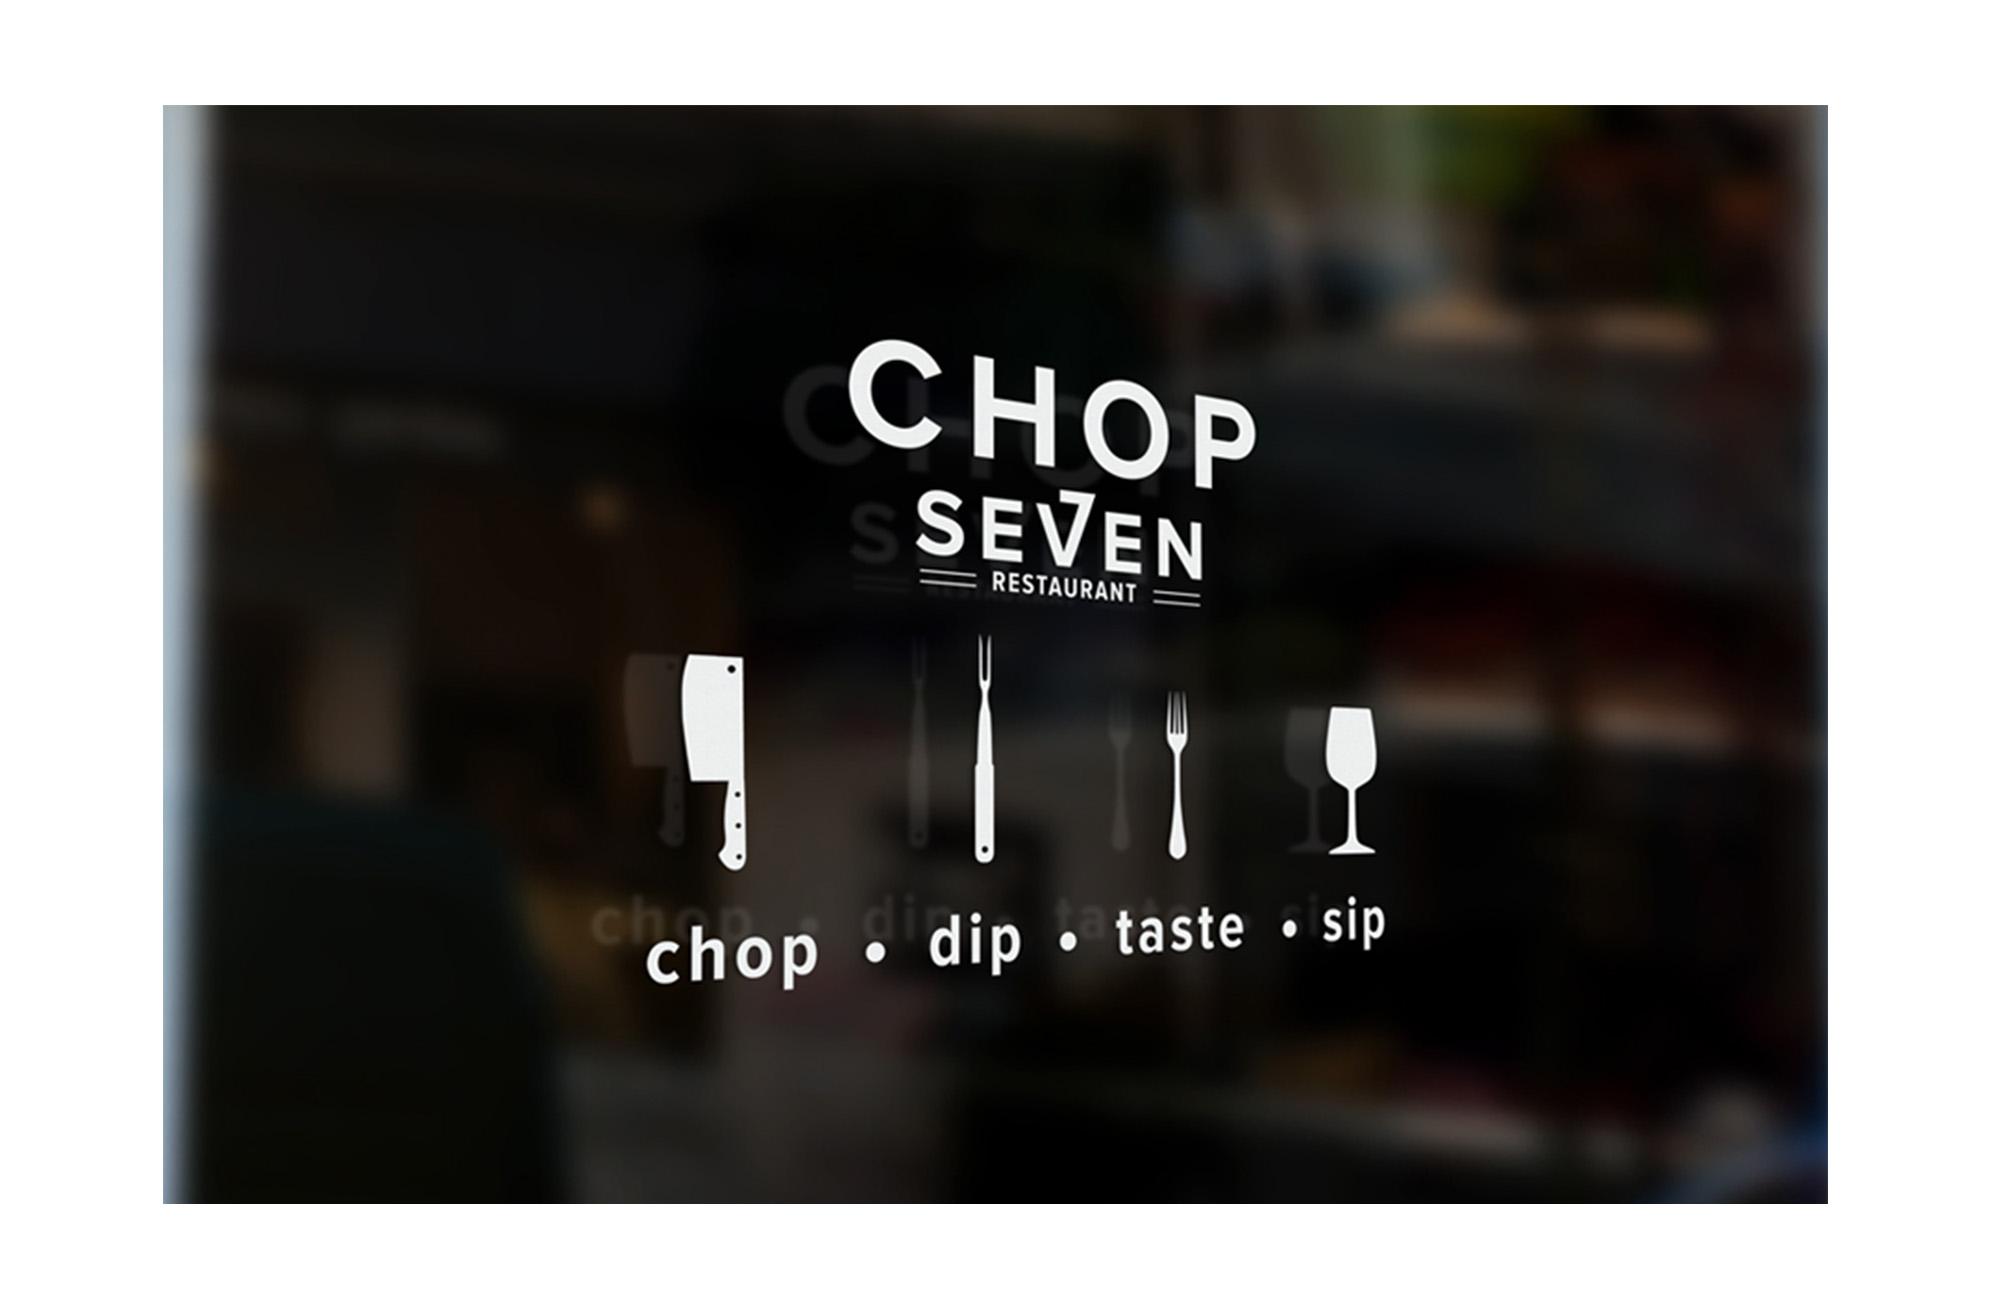 chop_01_0199.jpg